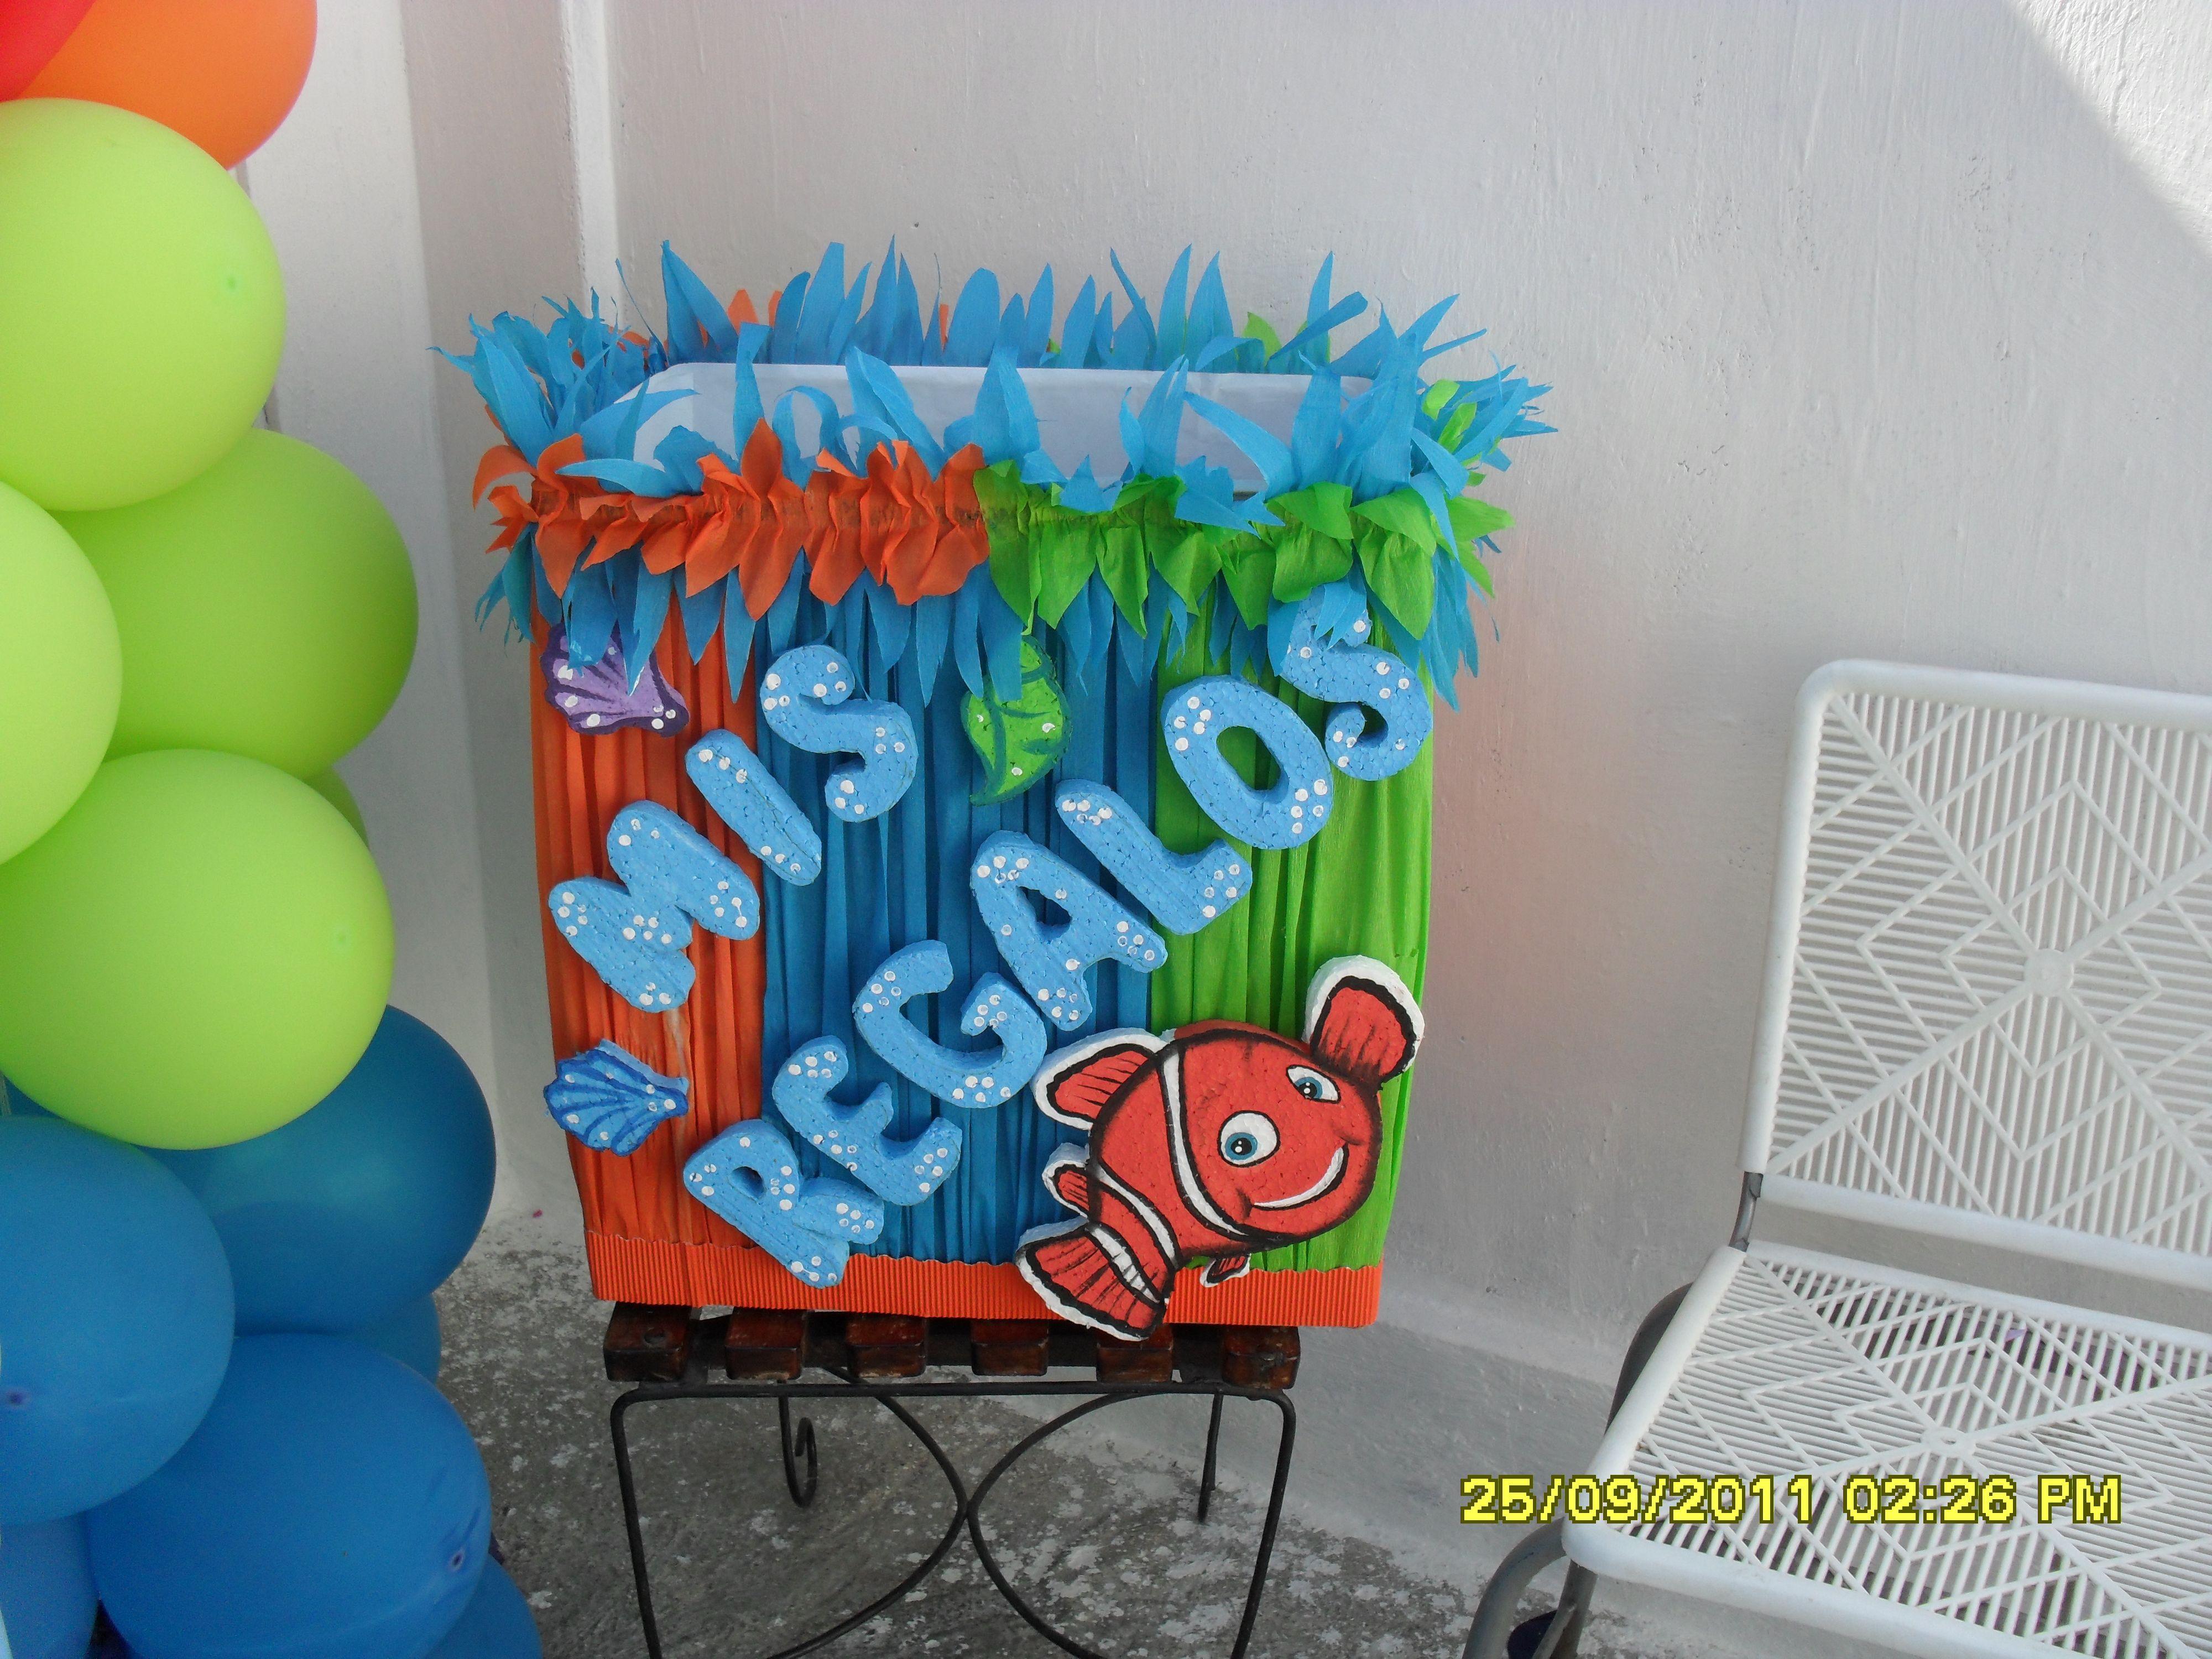 caja de regalos decorada con tema de nemo lluvia de ideas fiestas pinterest fiesta mickey mouse fiesta mickey and mickey mouse